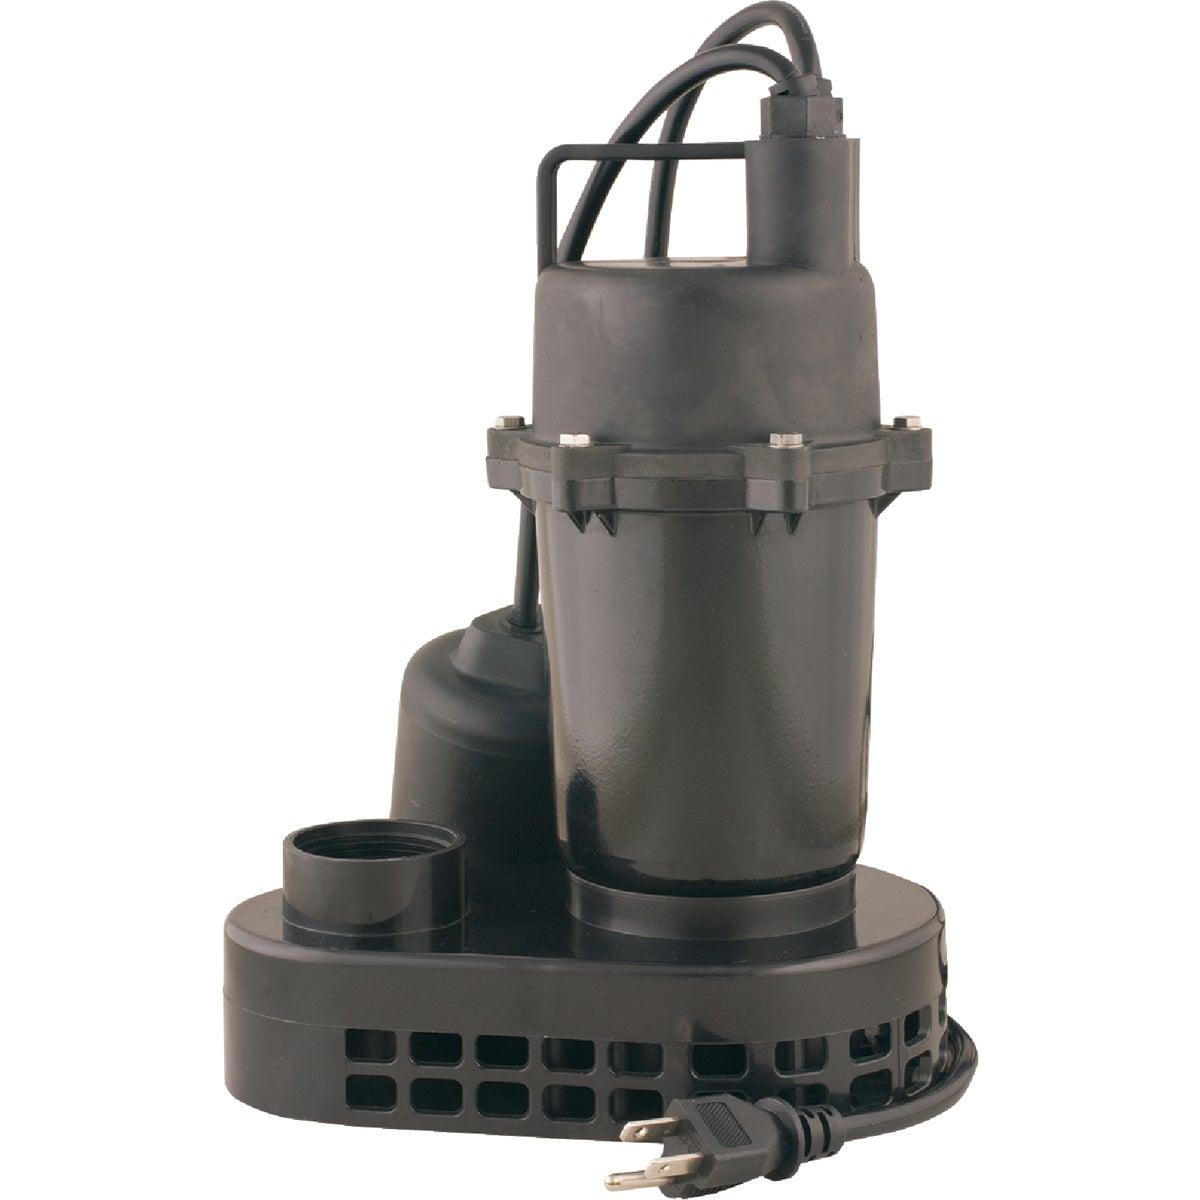 Flint Walling/Star 1/4HP PLASTIC SUMP PUMP 2SPHA-L